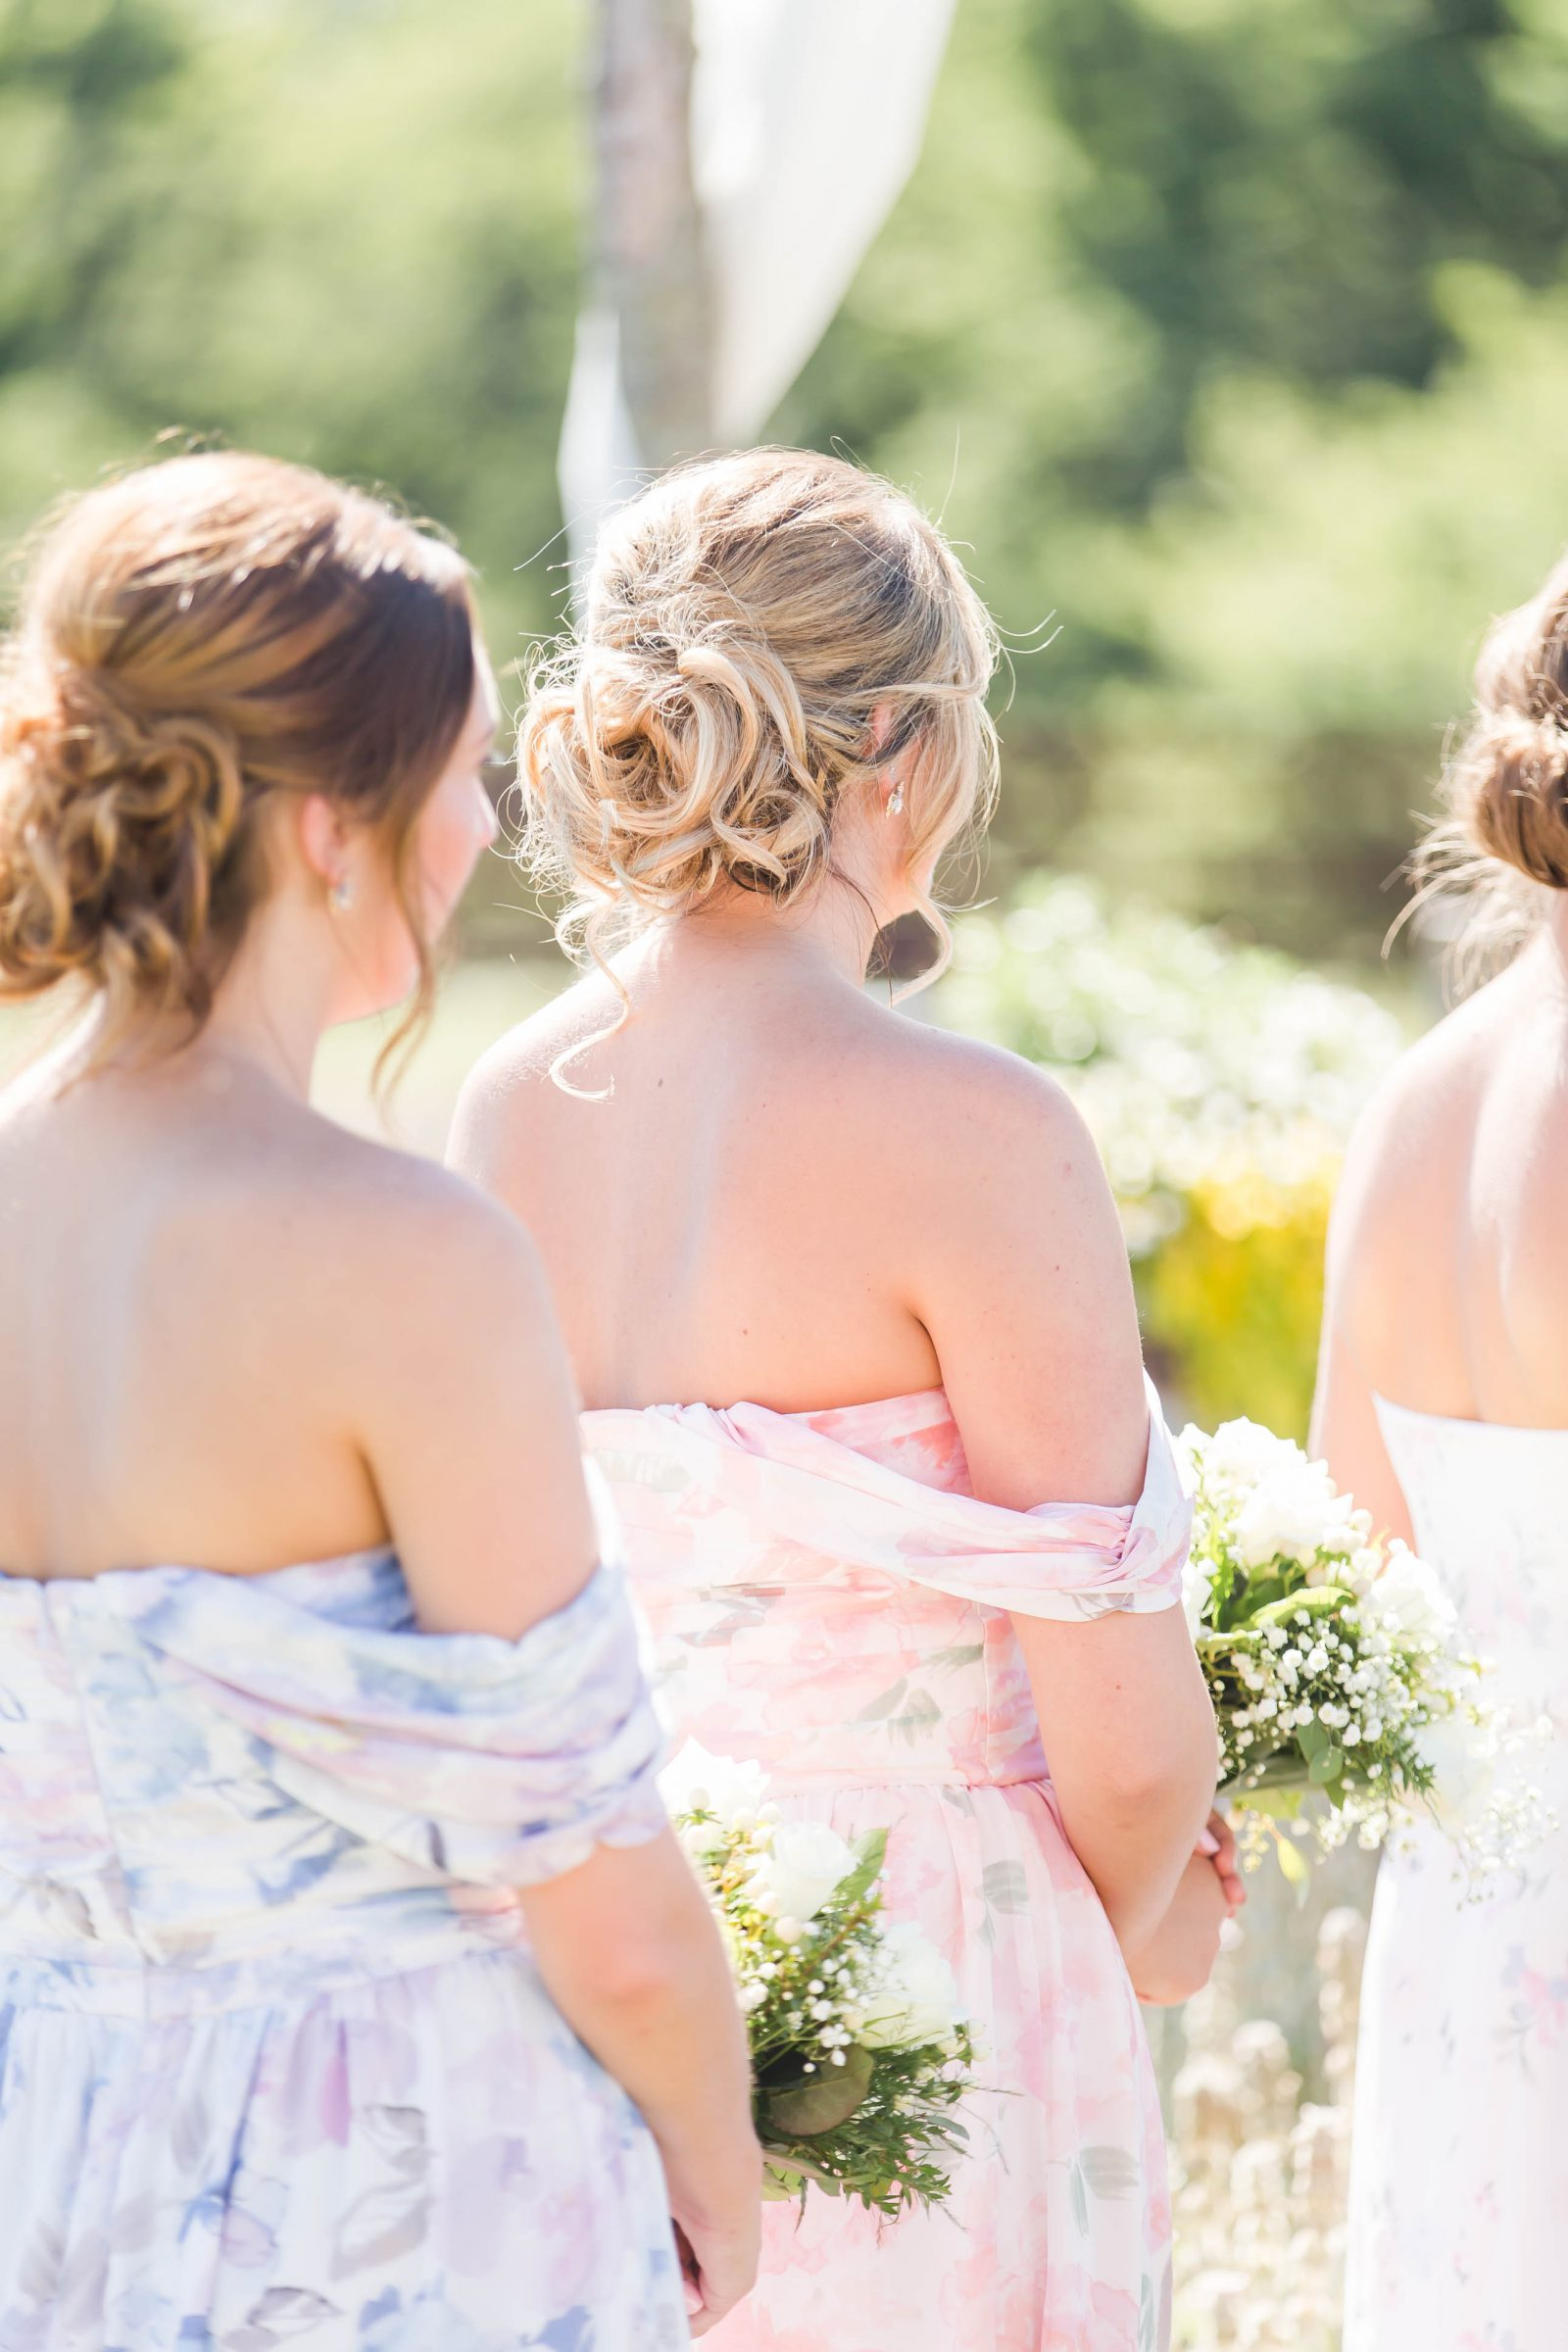 peacock-ridge-summer-wedding-photographer-akron-ohio-loren-jackson-photography-73